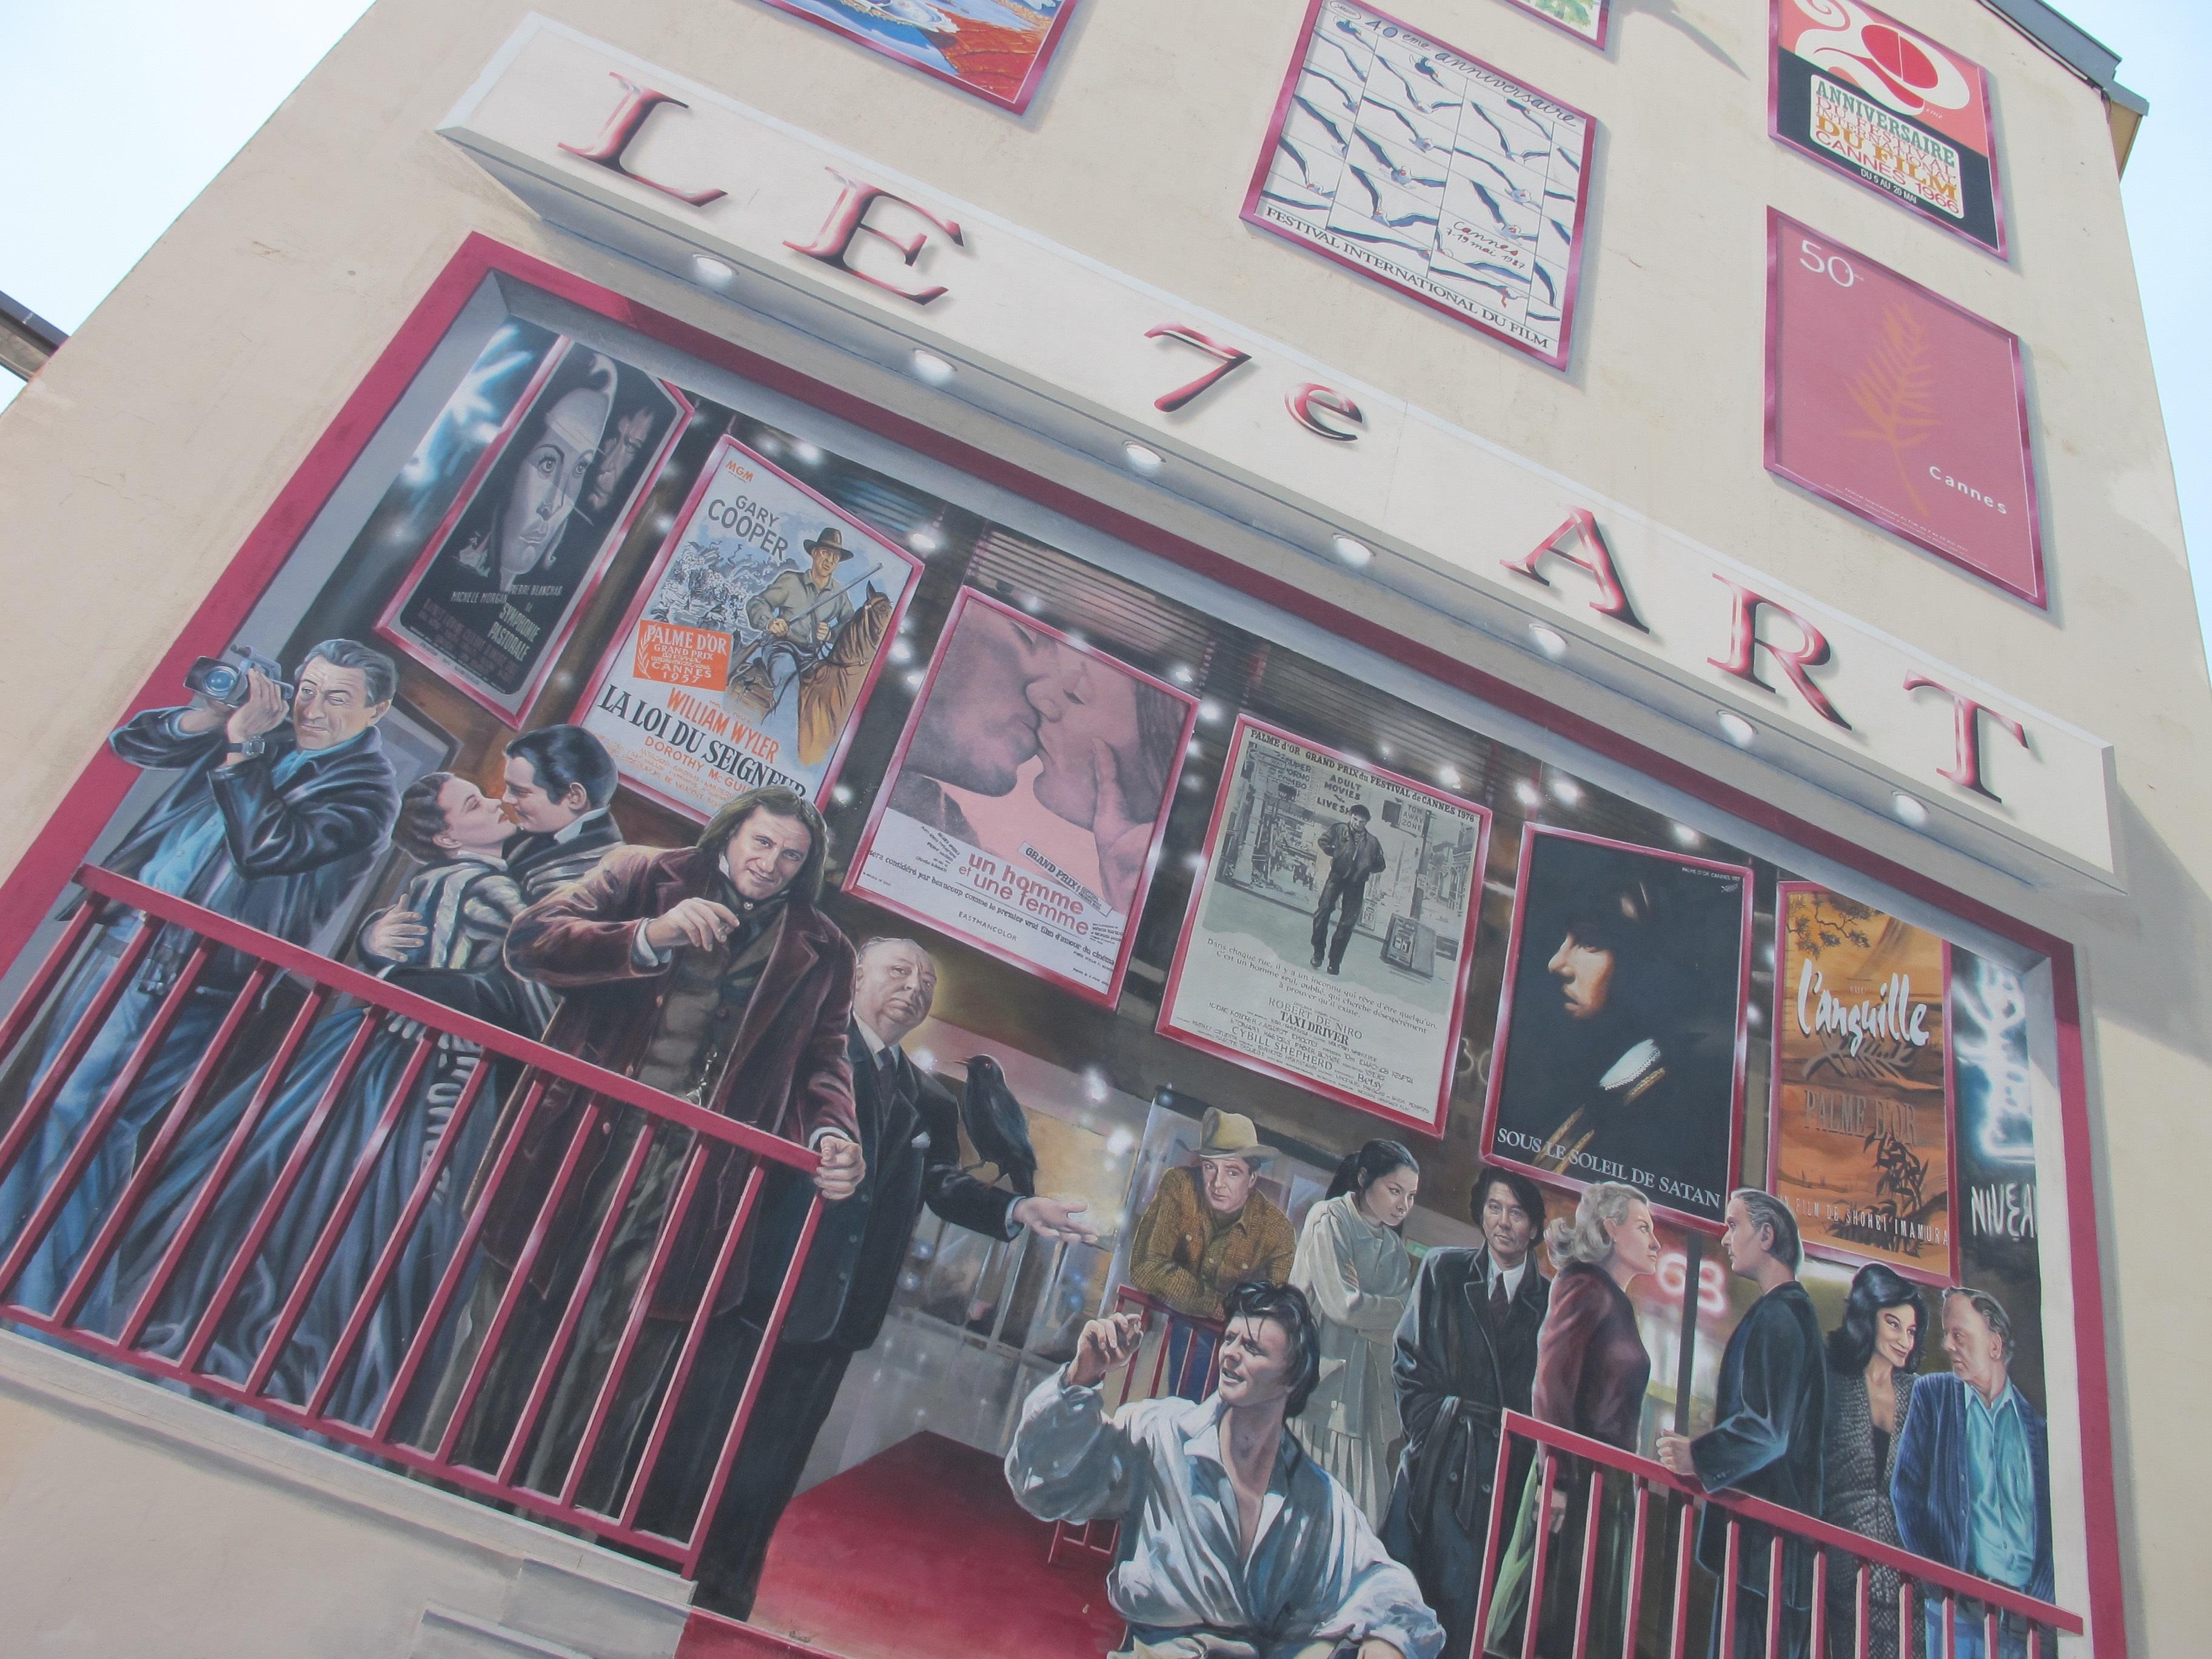 Mur peint de l'Hôtel 7Art